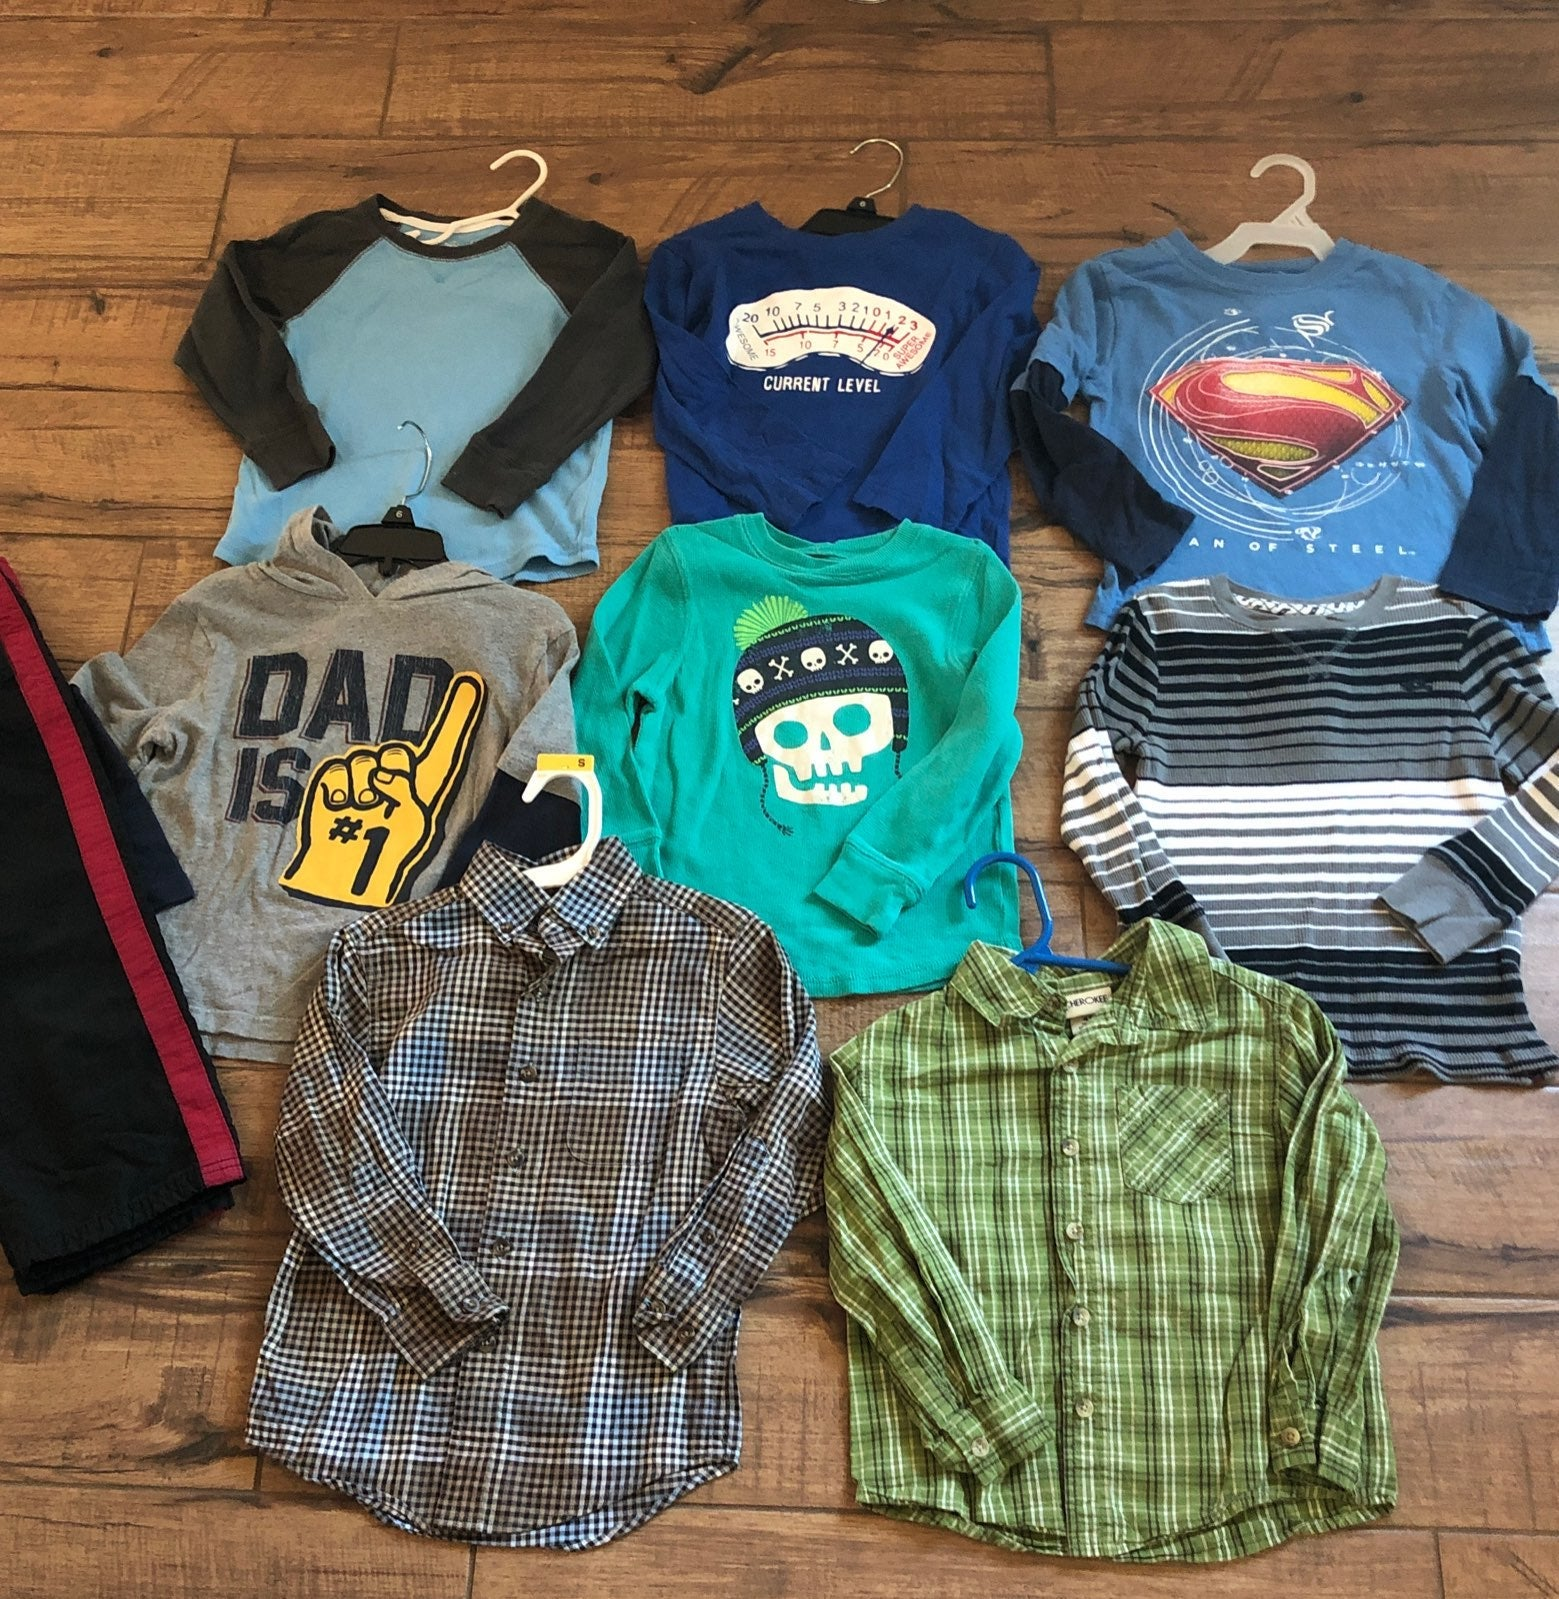 Boys Size 4T Clothing Lot